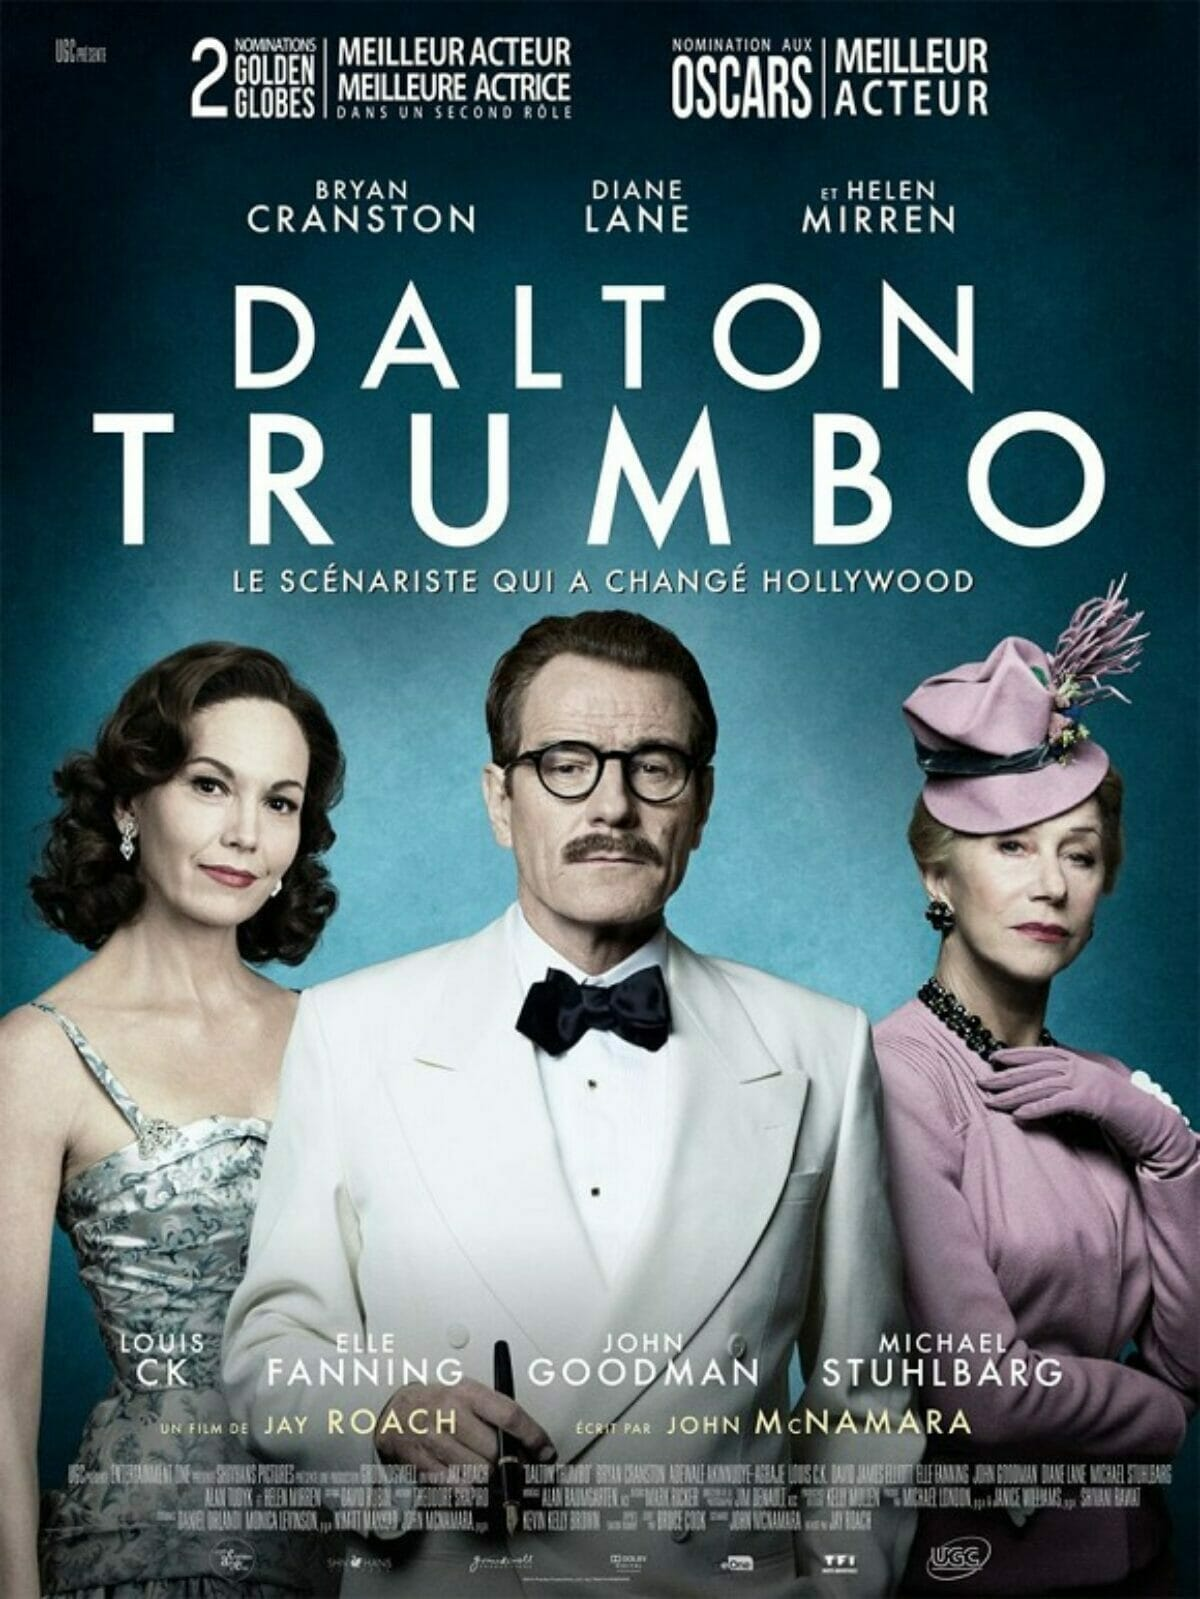 Dalton-Trumbo-poster-France